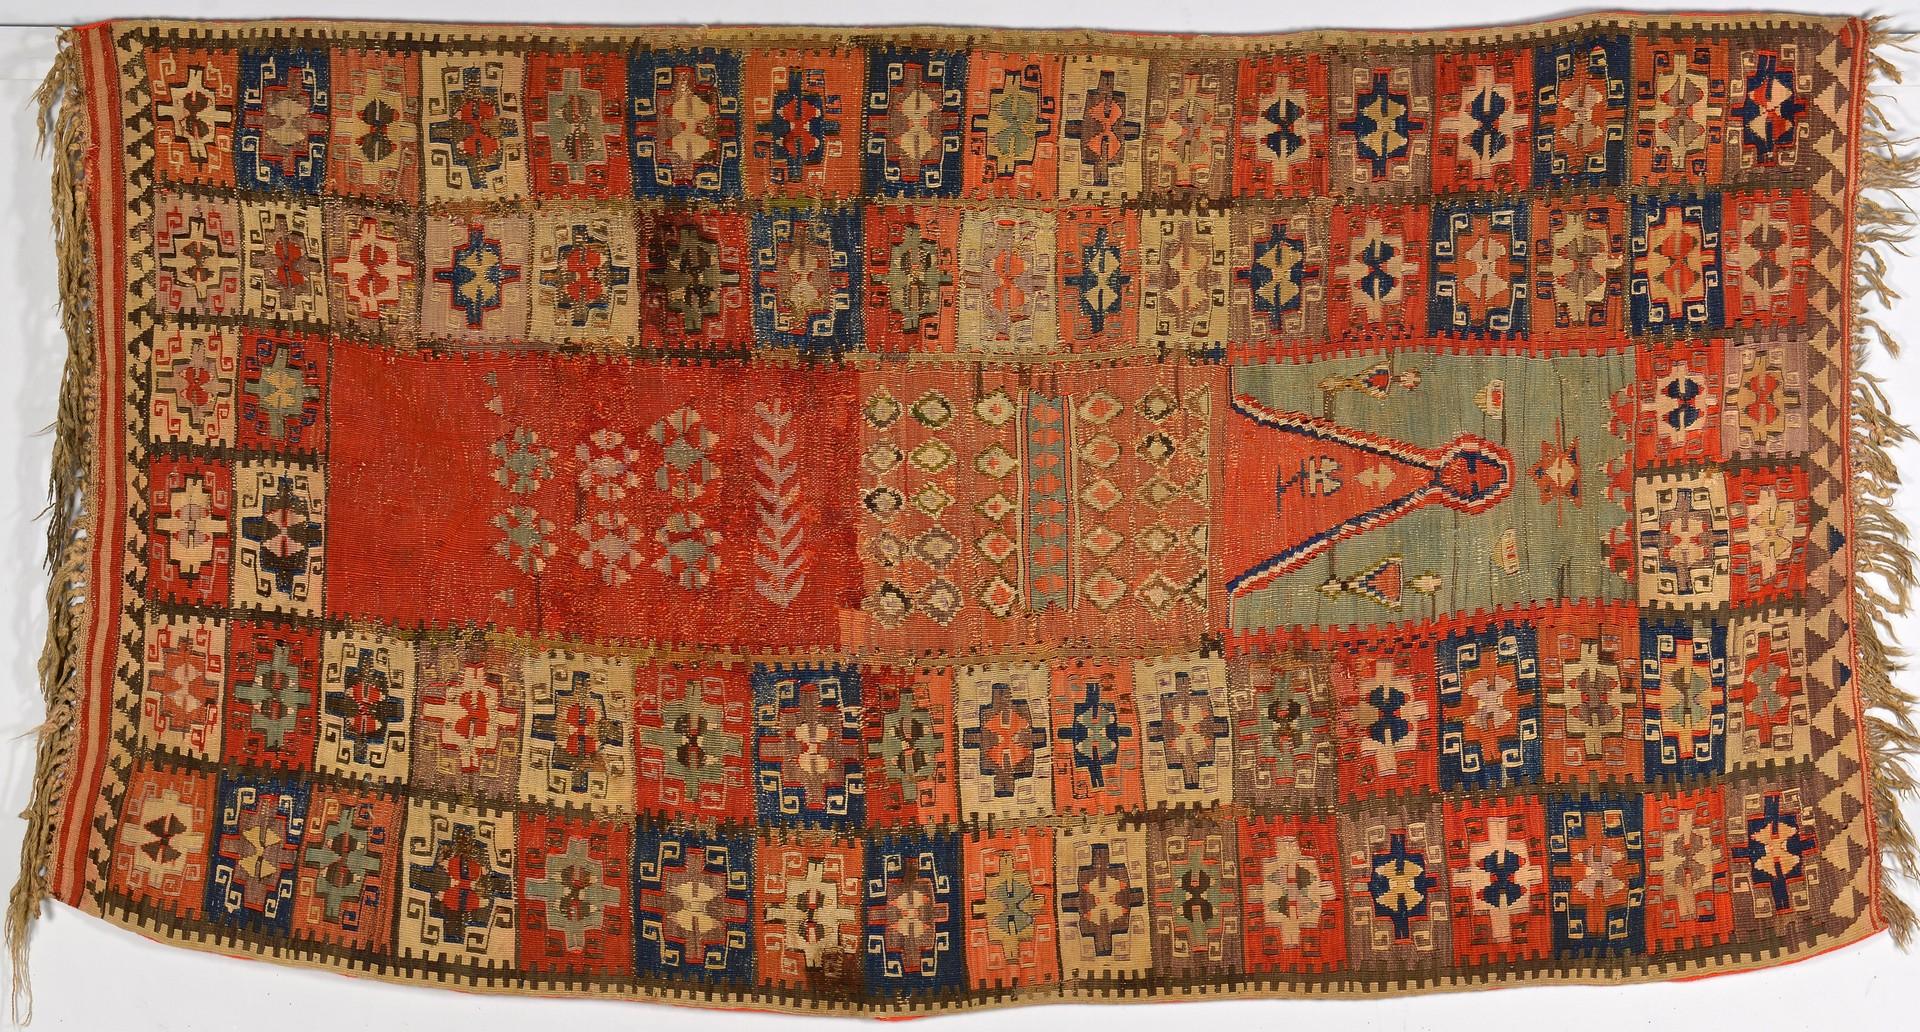 Lot 260: Antique Anatolian Kilim Prayer Rug, 19th century